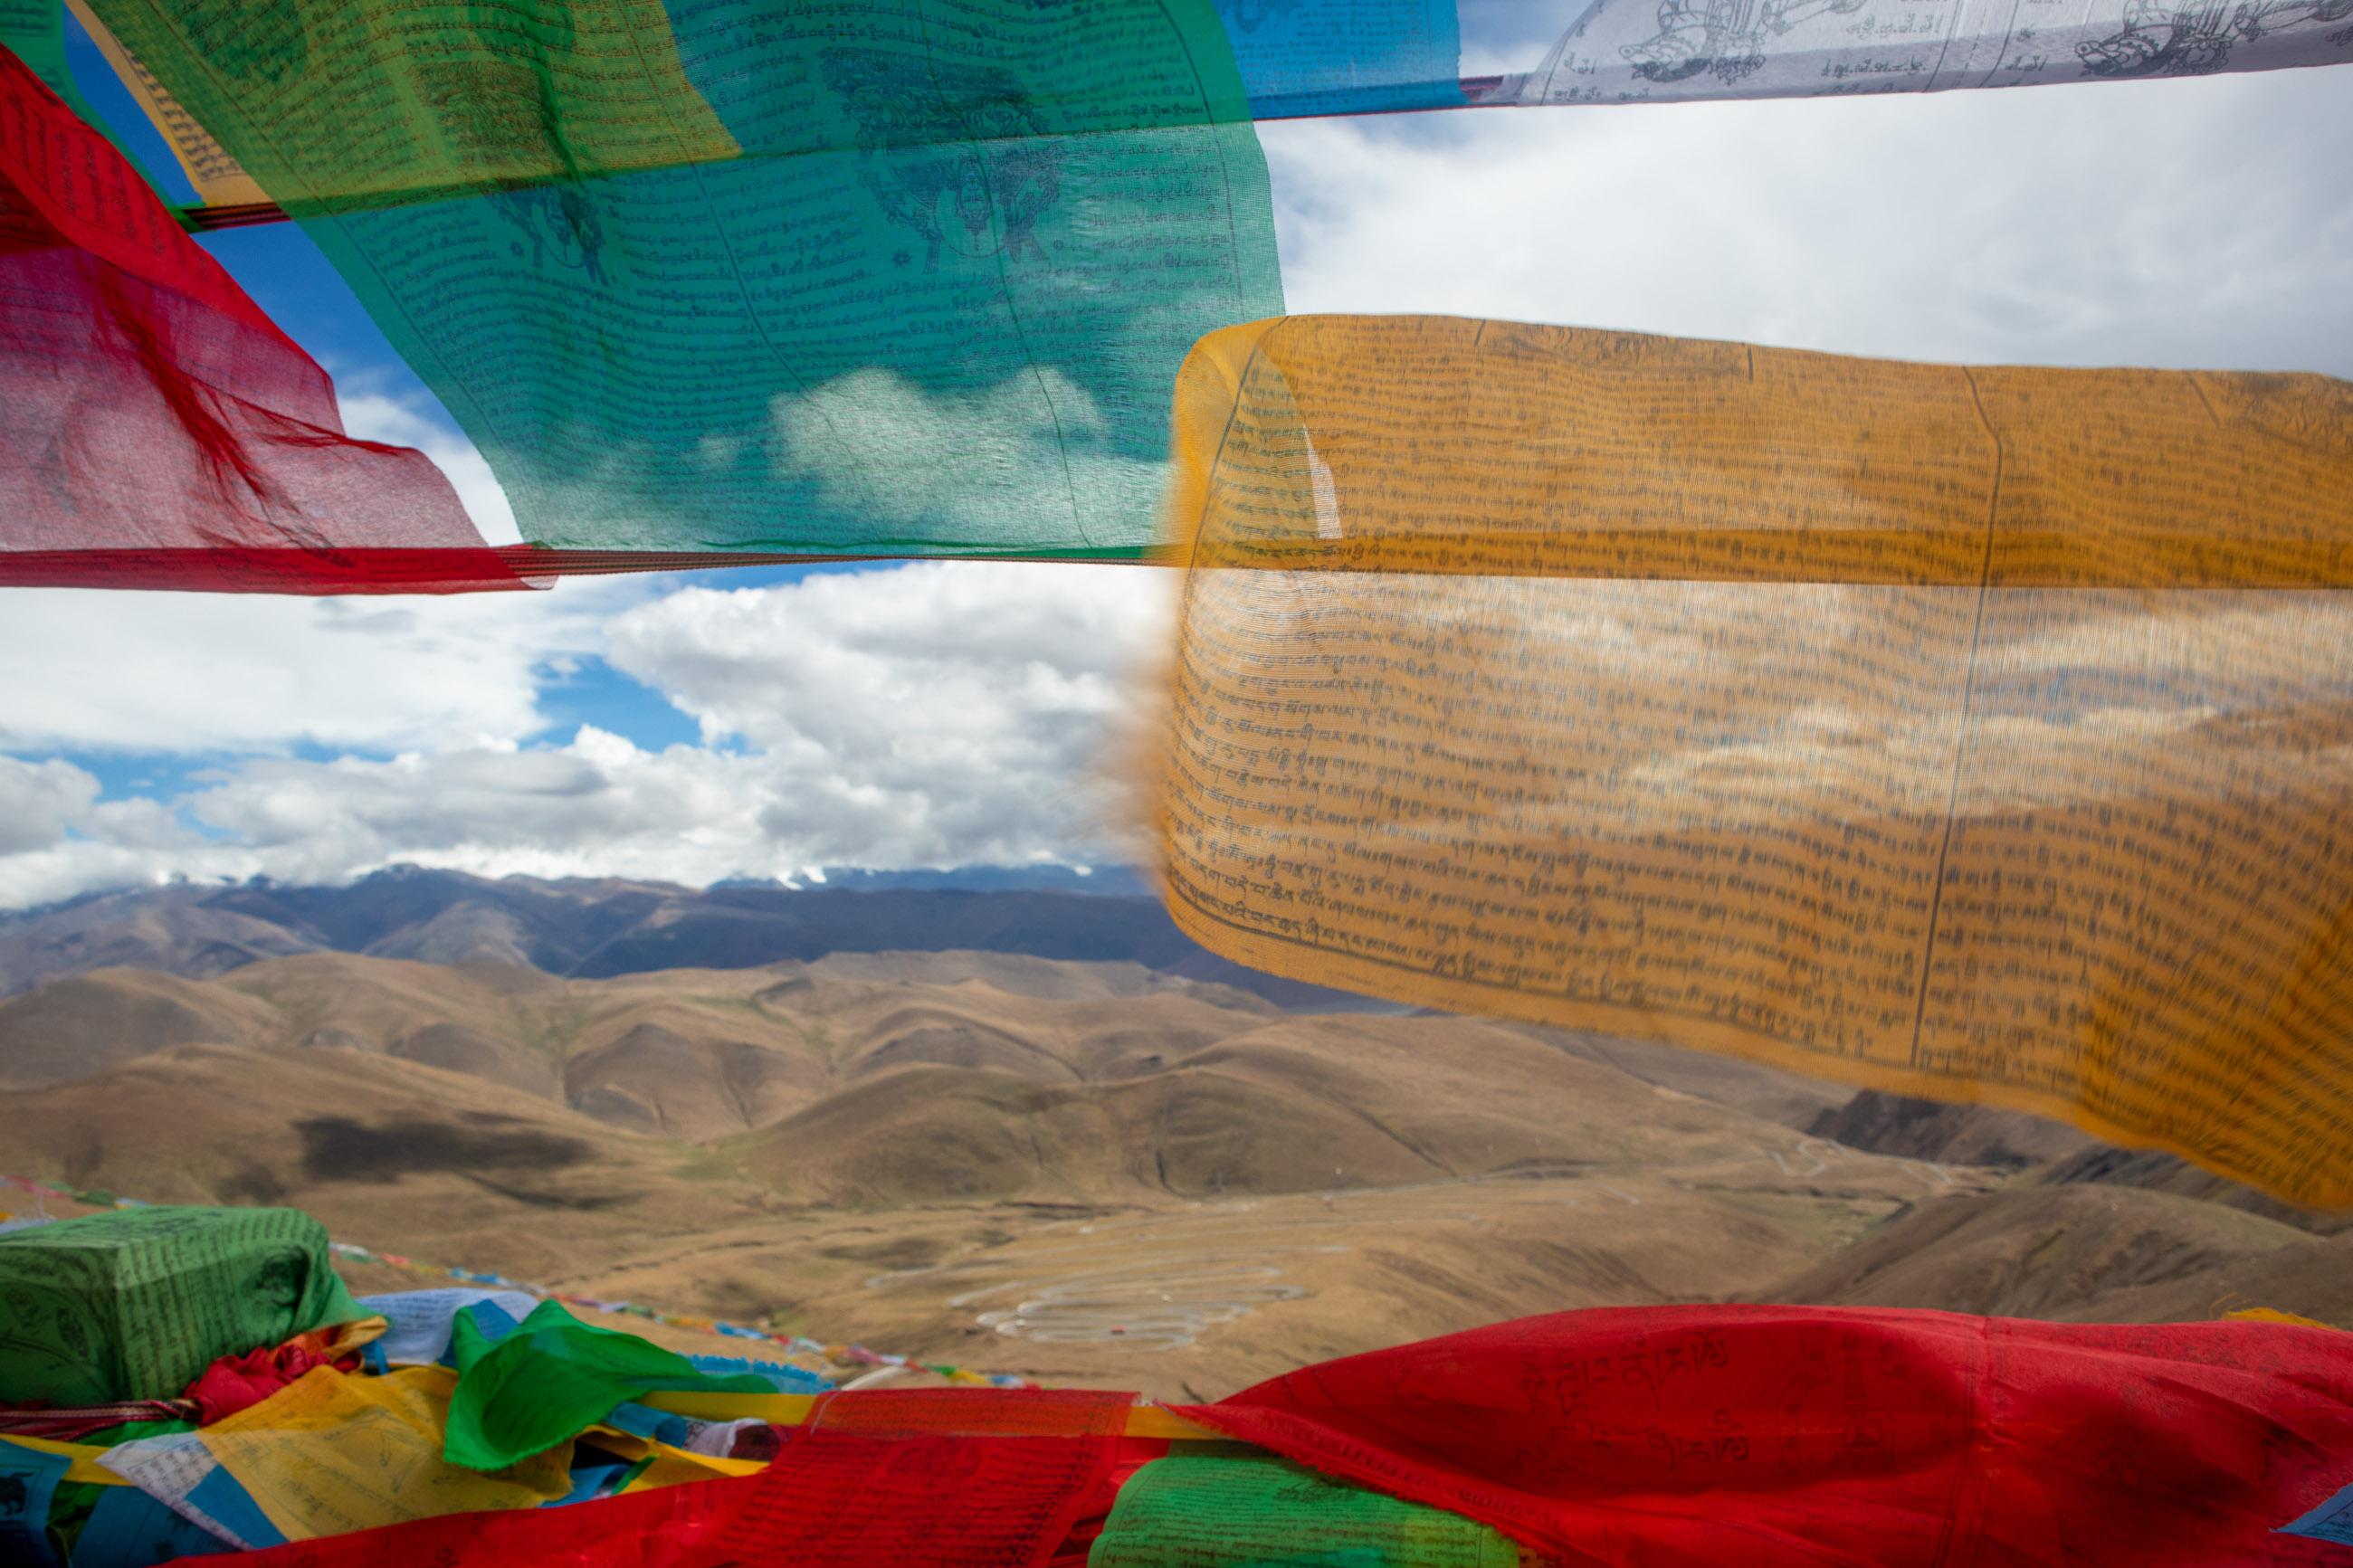 https://bubo.sk/uploads/galleries/16317/nikol_deckous_img_tibet_1214-40.jpg